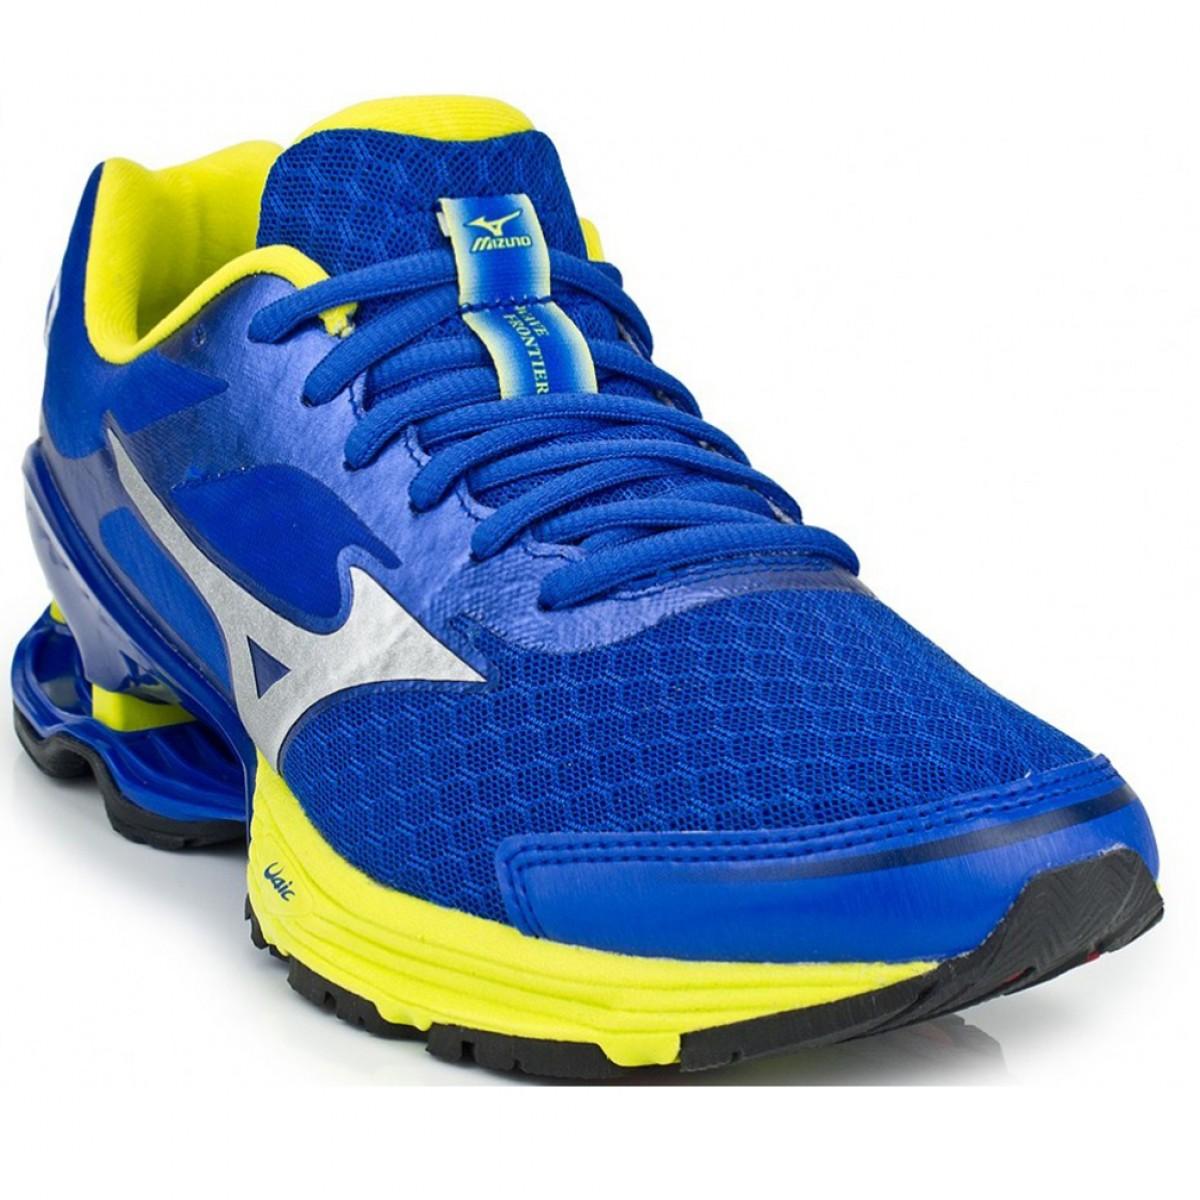 Tênis Mizuno Wave Frontier 8 Masculino Azul e Amarelo - Compre Agora ... 07c04aff131